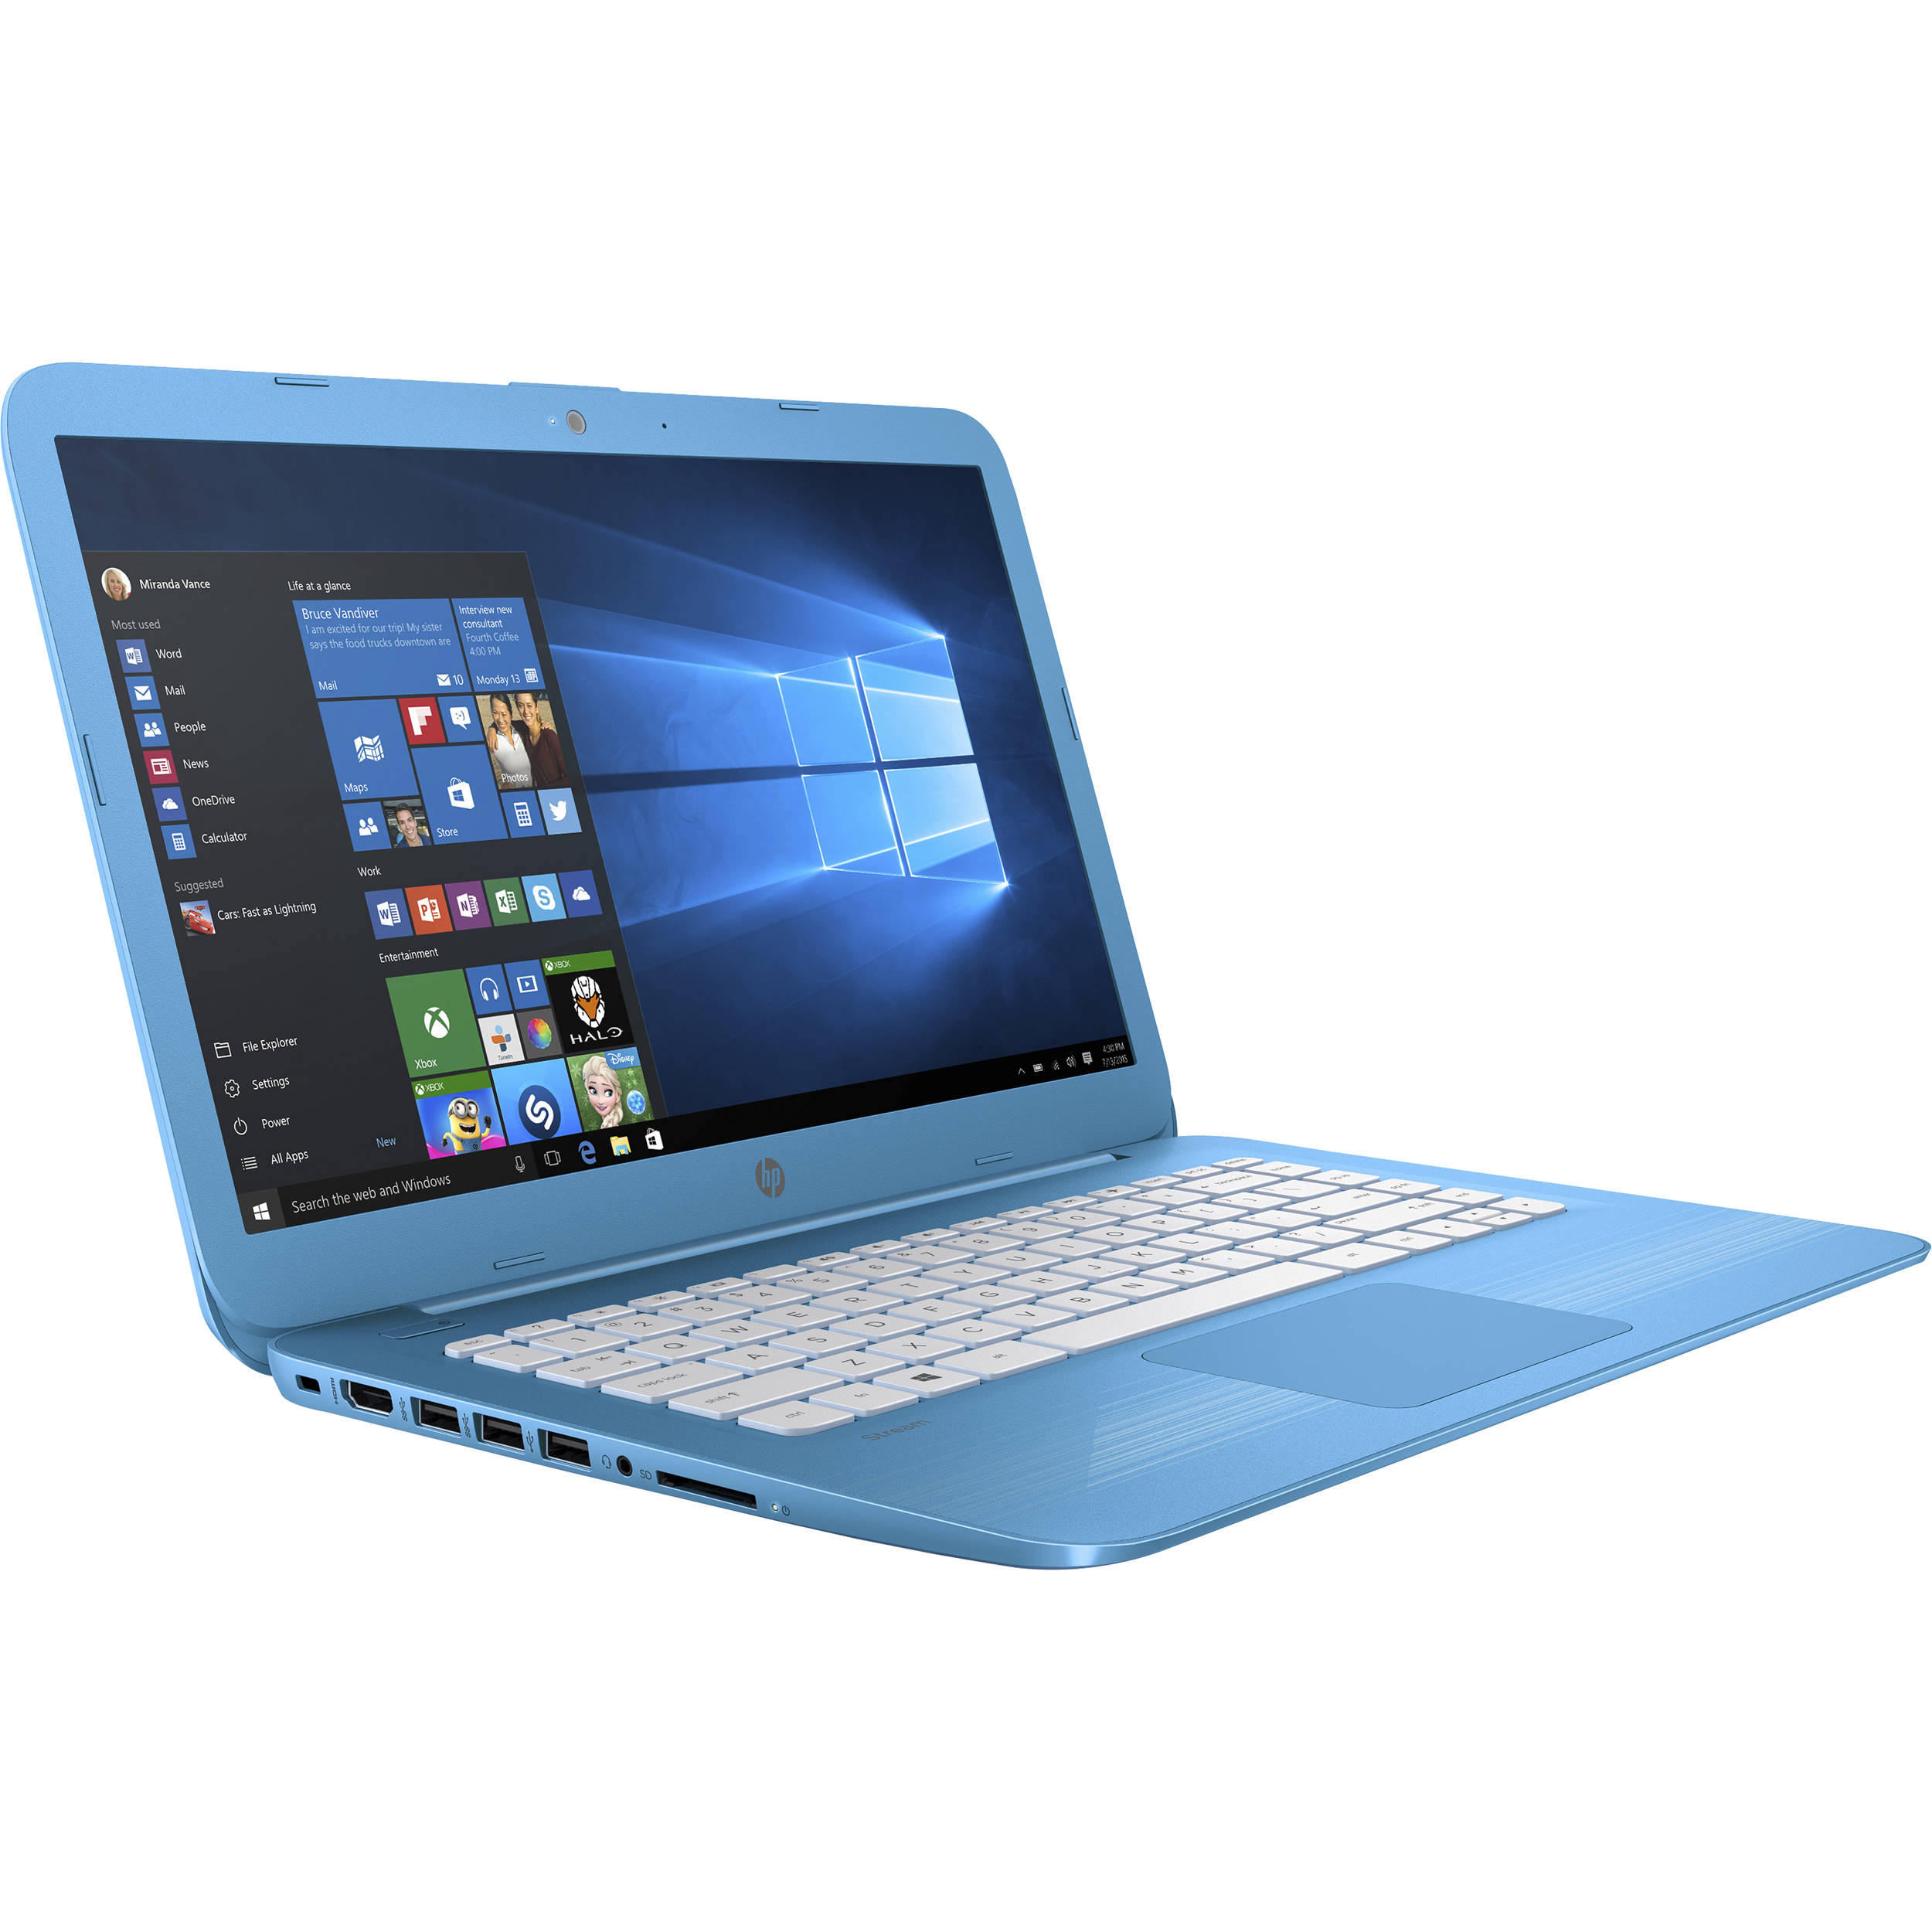 Hp notebook quickdock review - Hp 14 Stream 14 Ax010nr Notebook Aqua